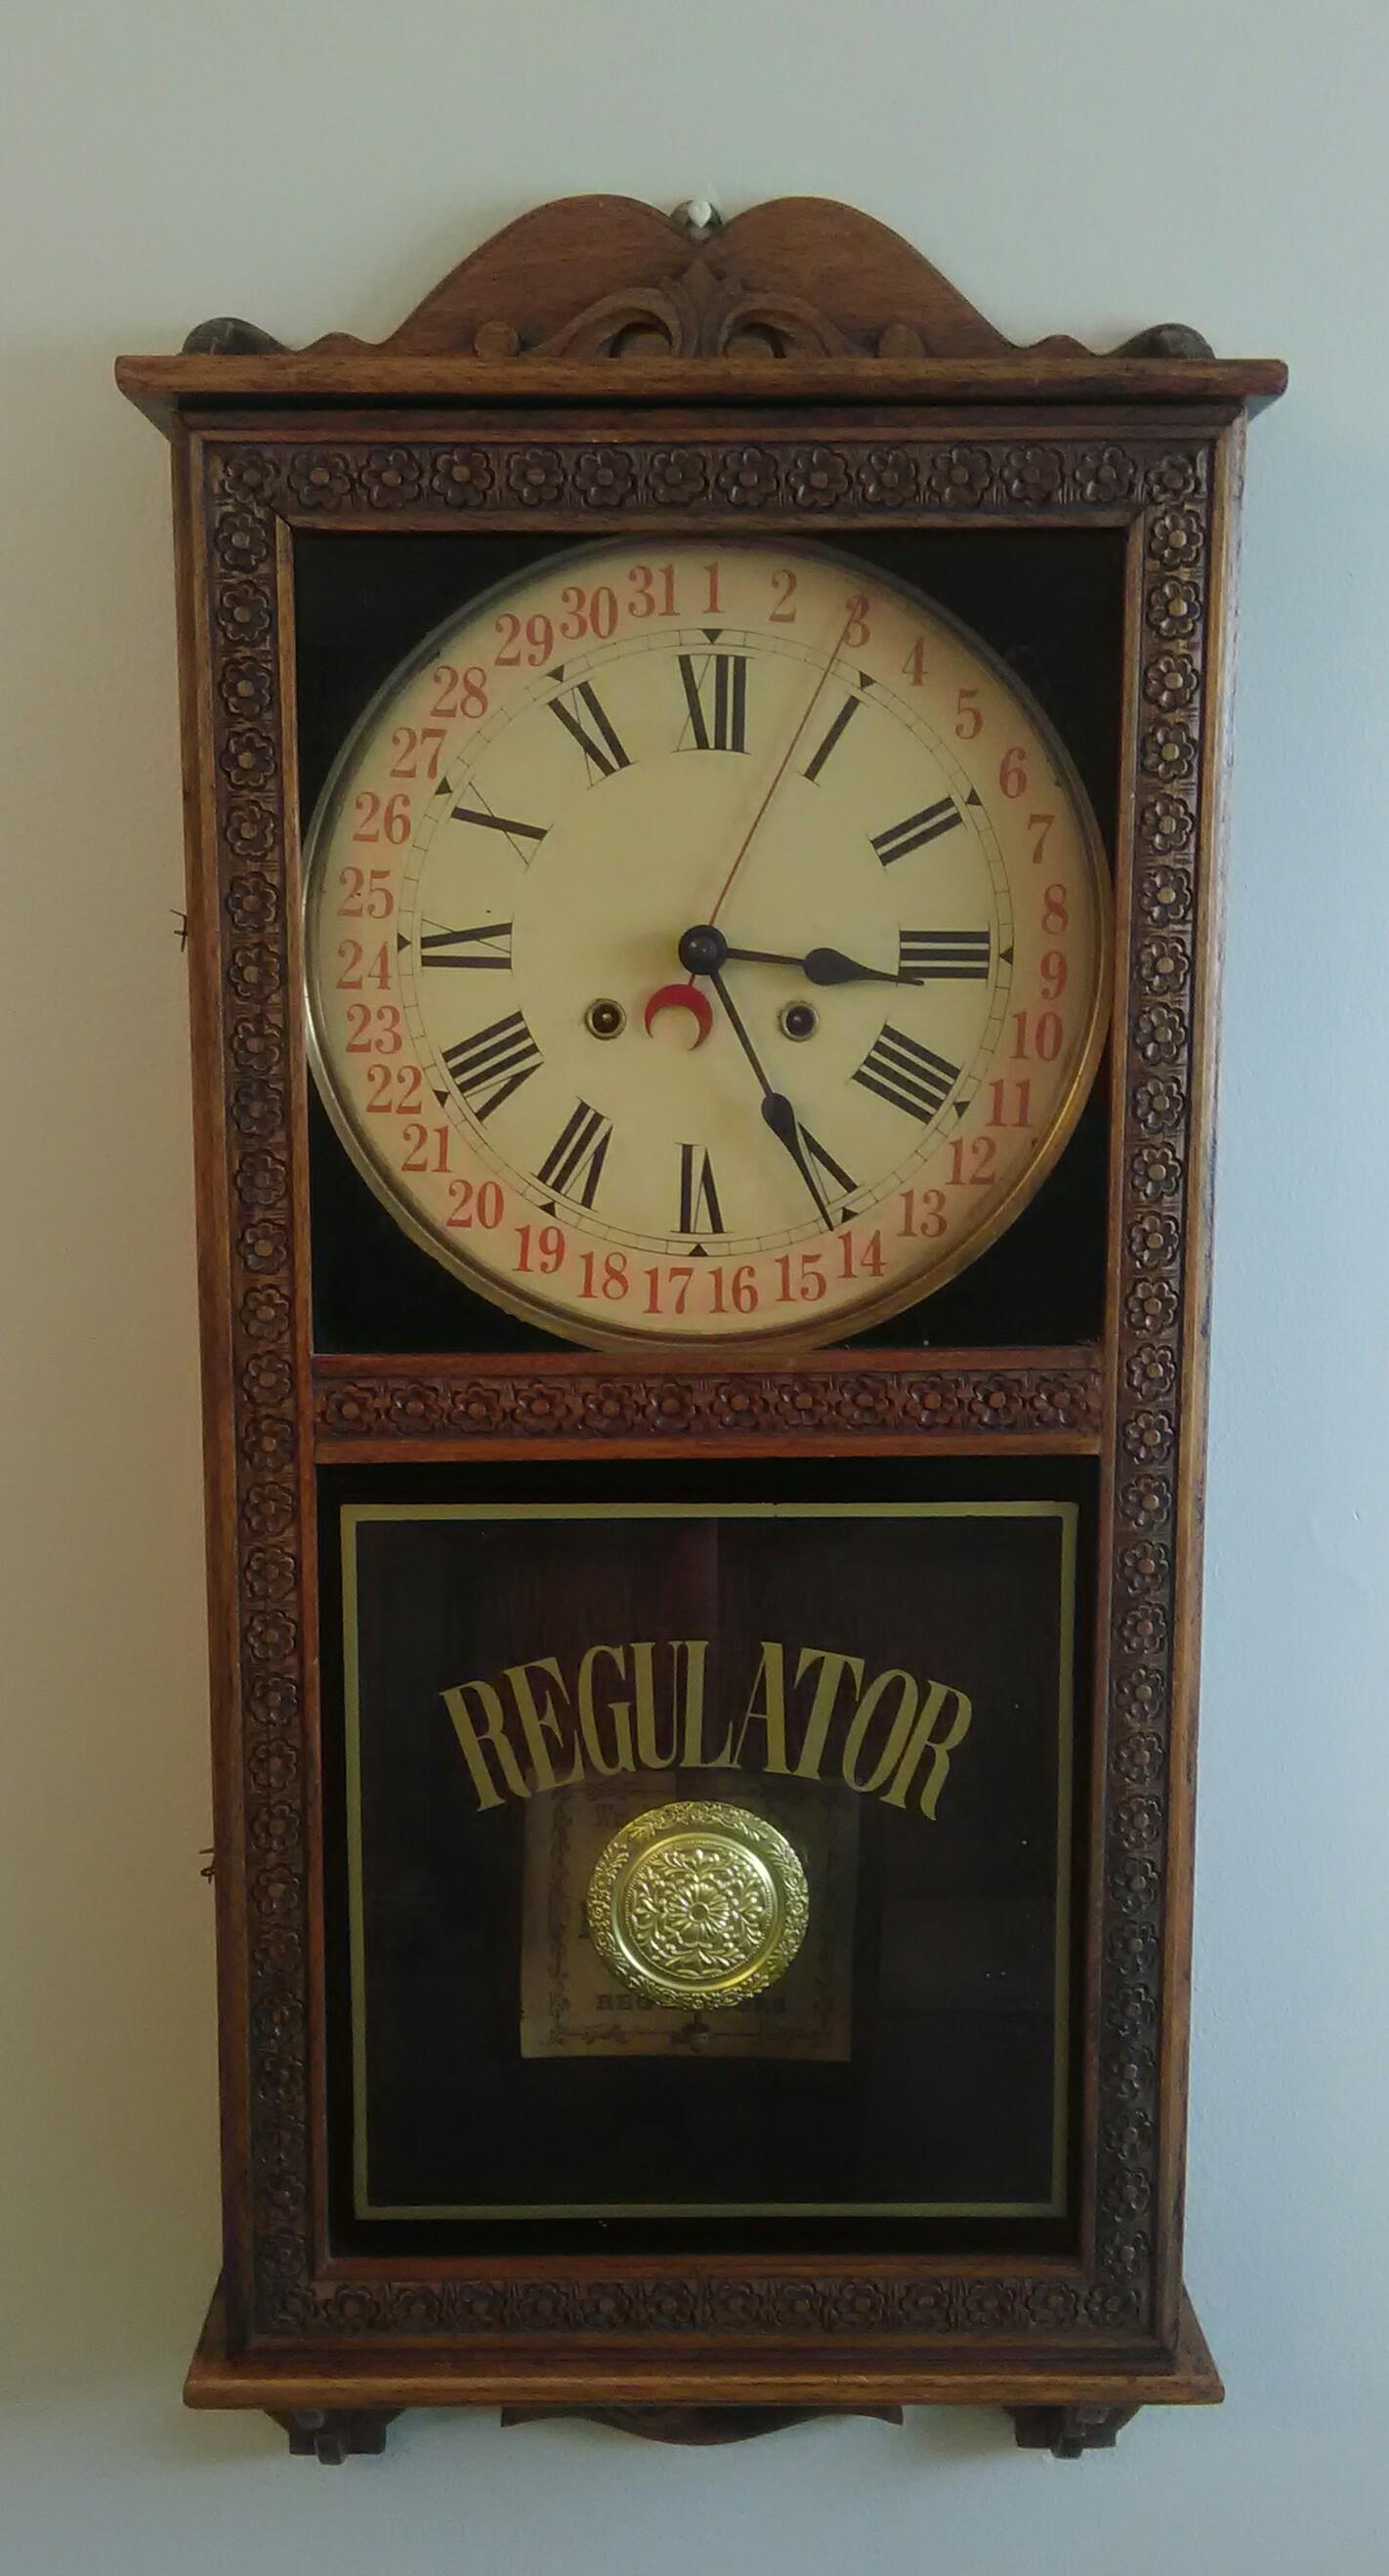 Vintage Regulator Wall Clock Wm L Gilbert Amp Co 8 Day And